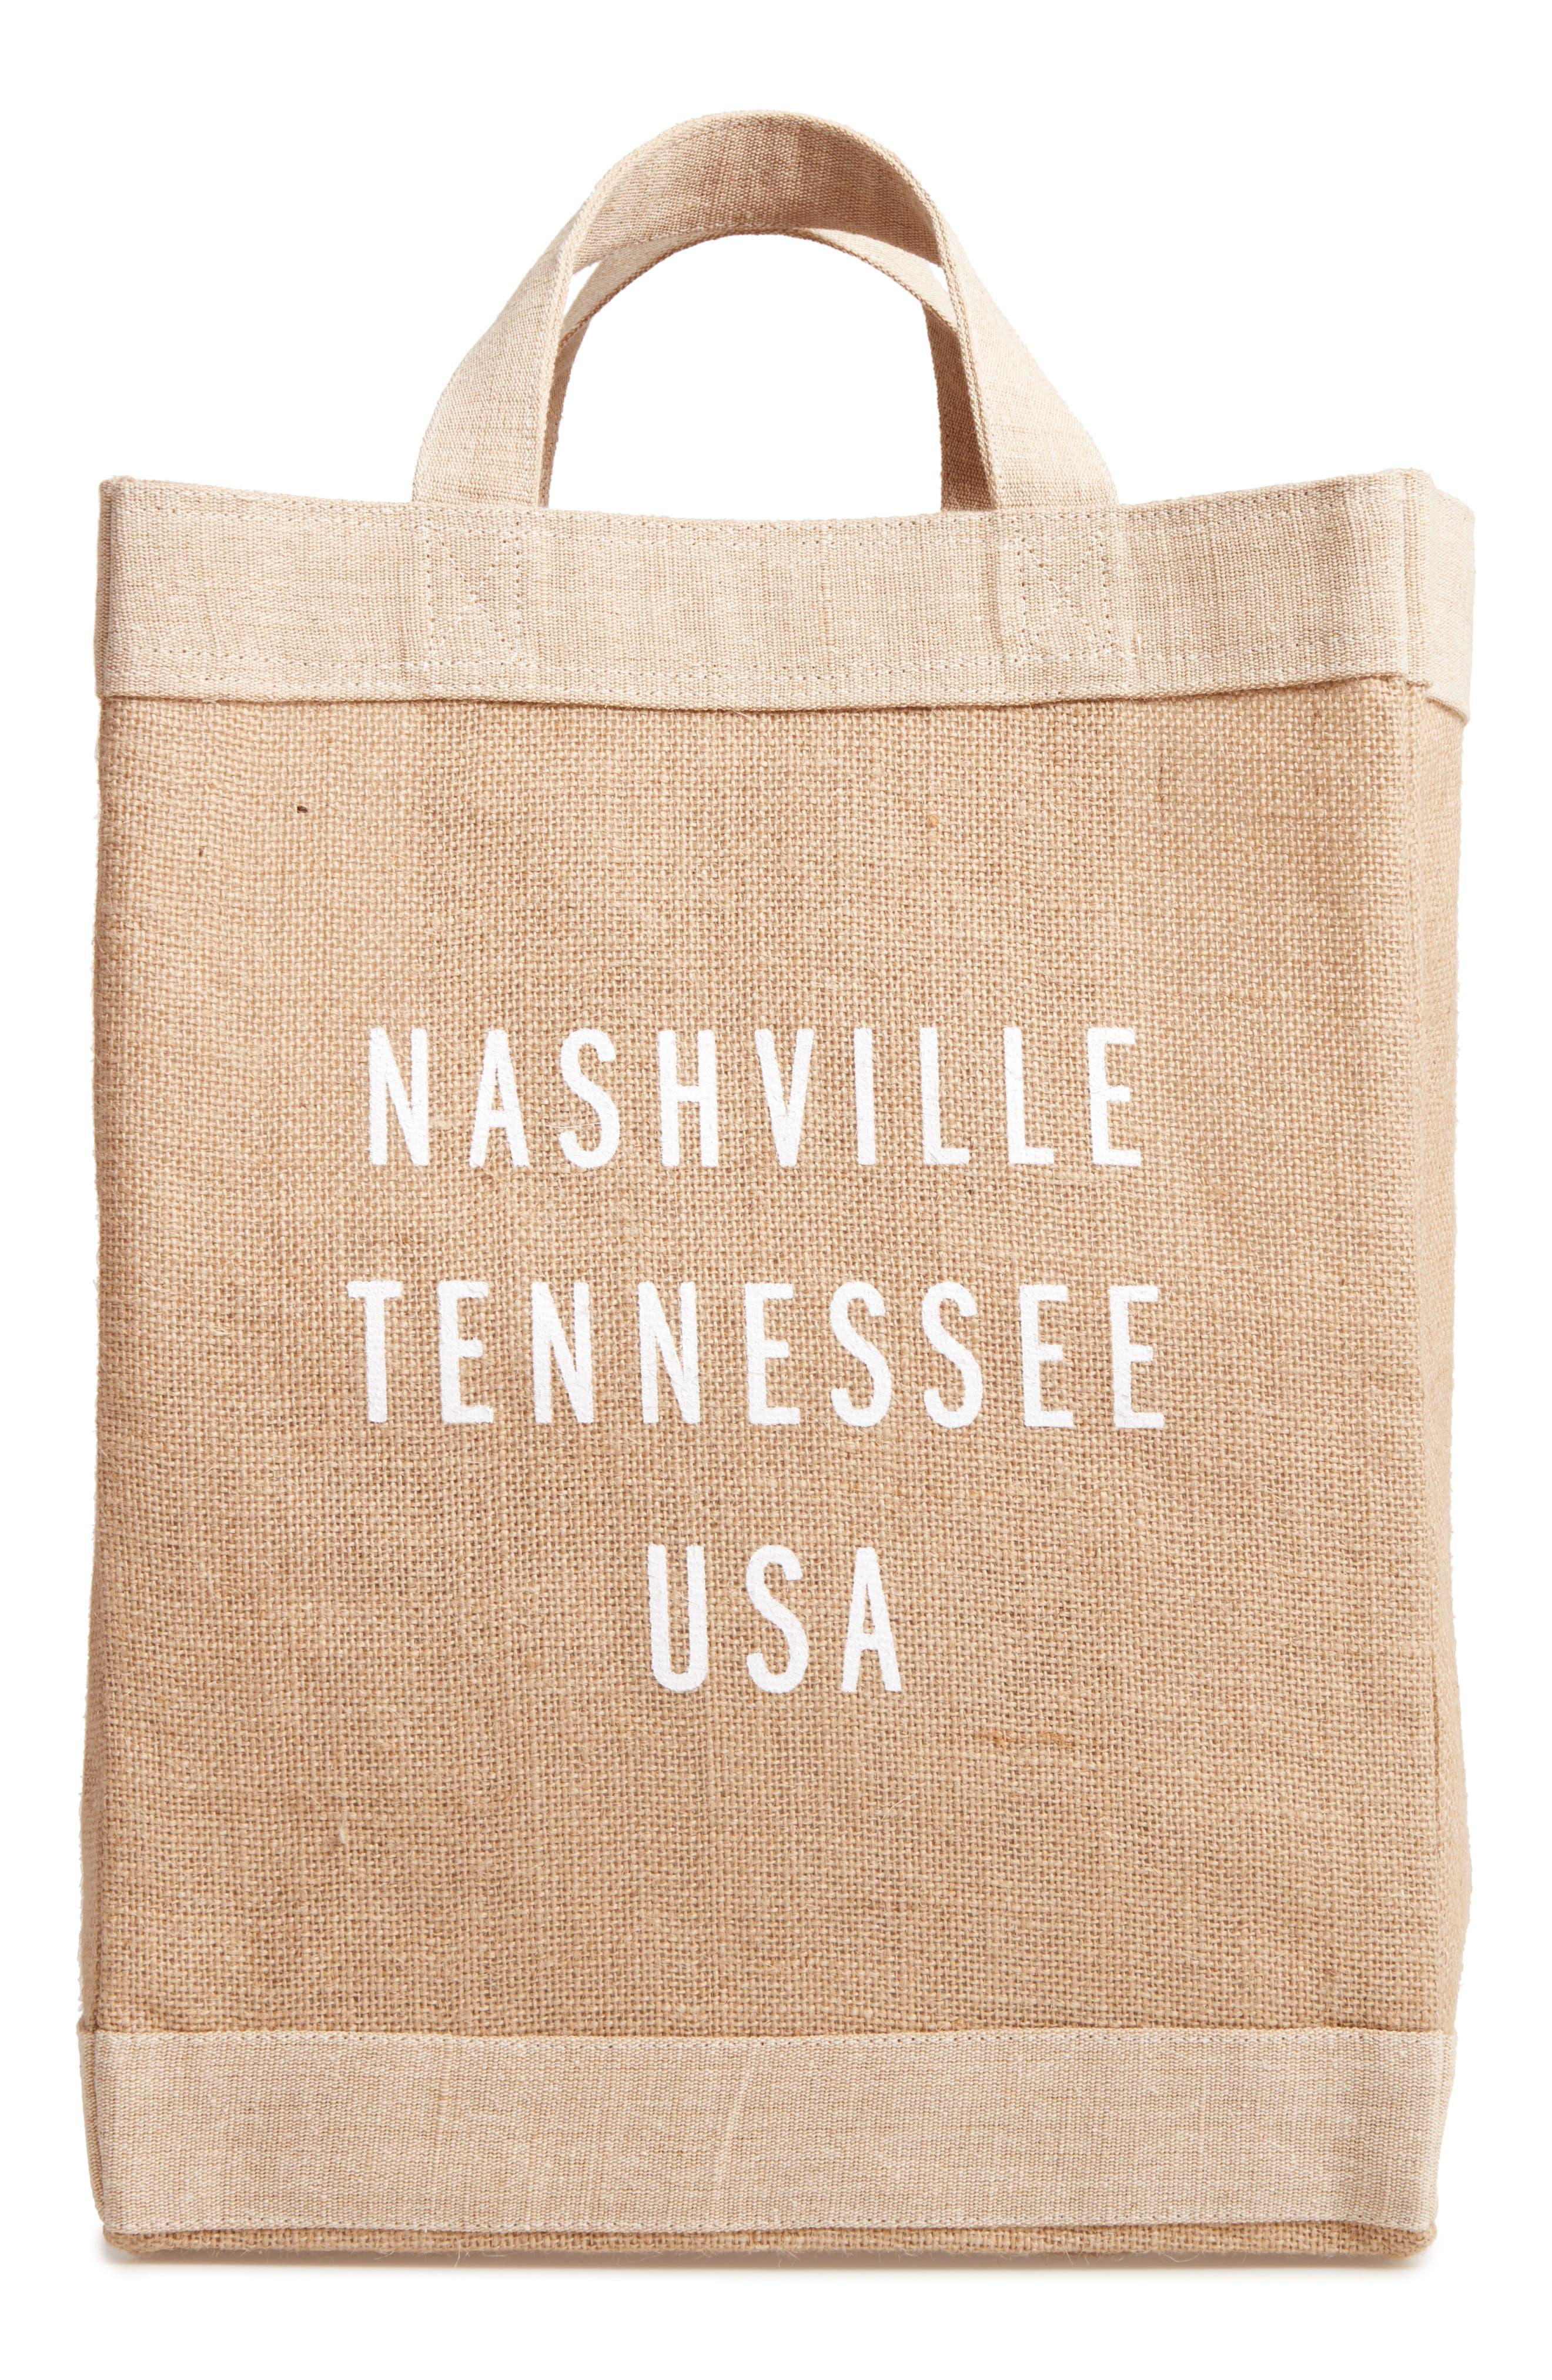 Nashville Simple Market Bag,                             Main thumbnail 1, color,                             200